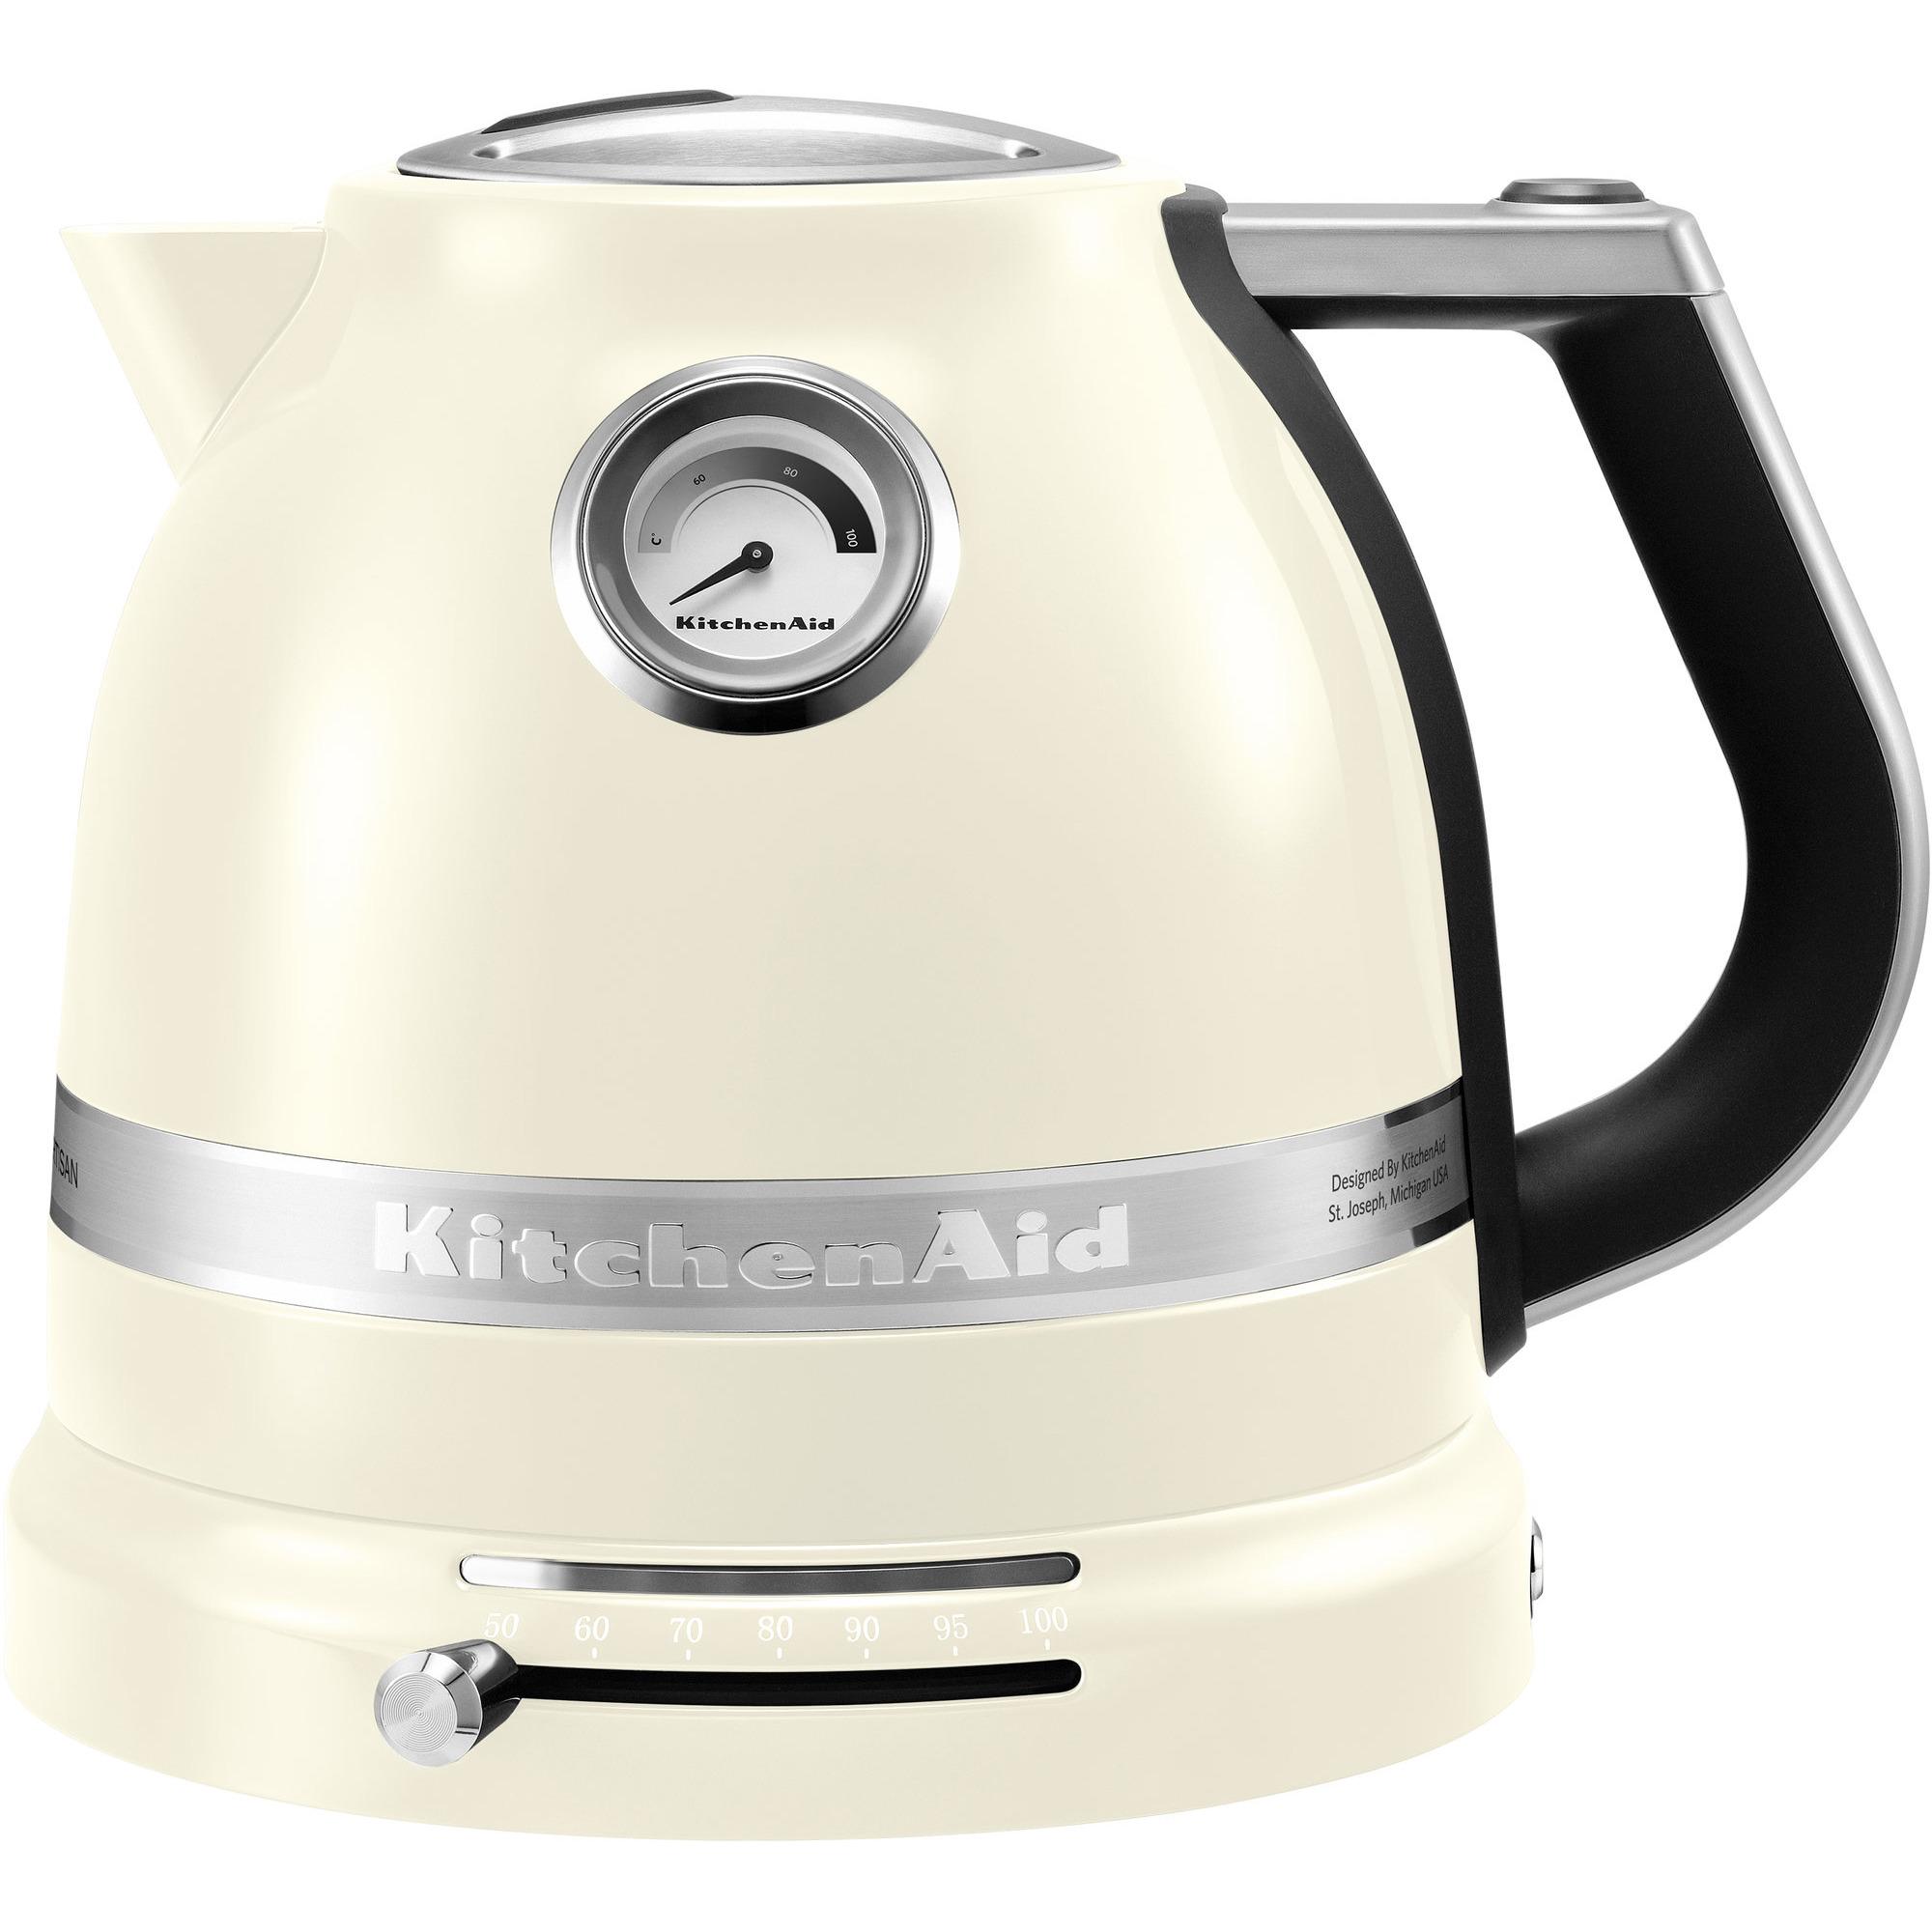 KitchenAid Artisan Vattenkokare 1.5L – Creme